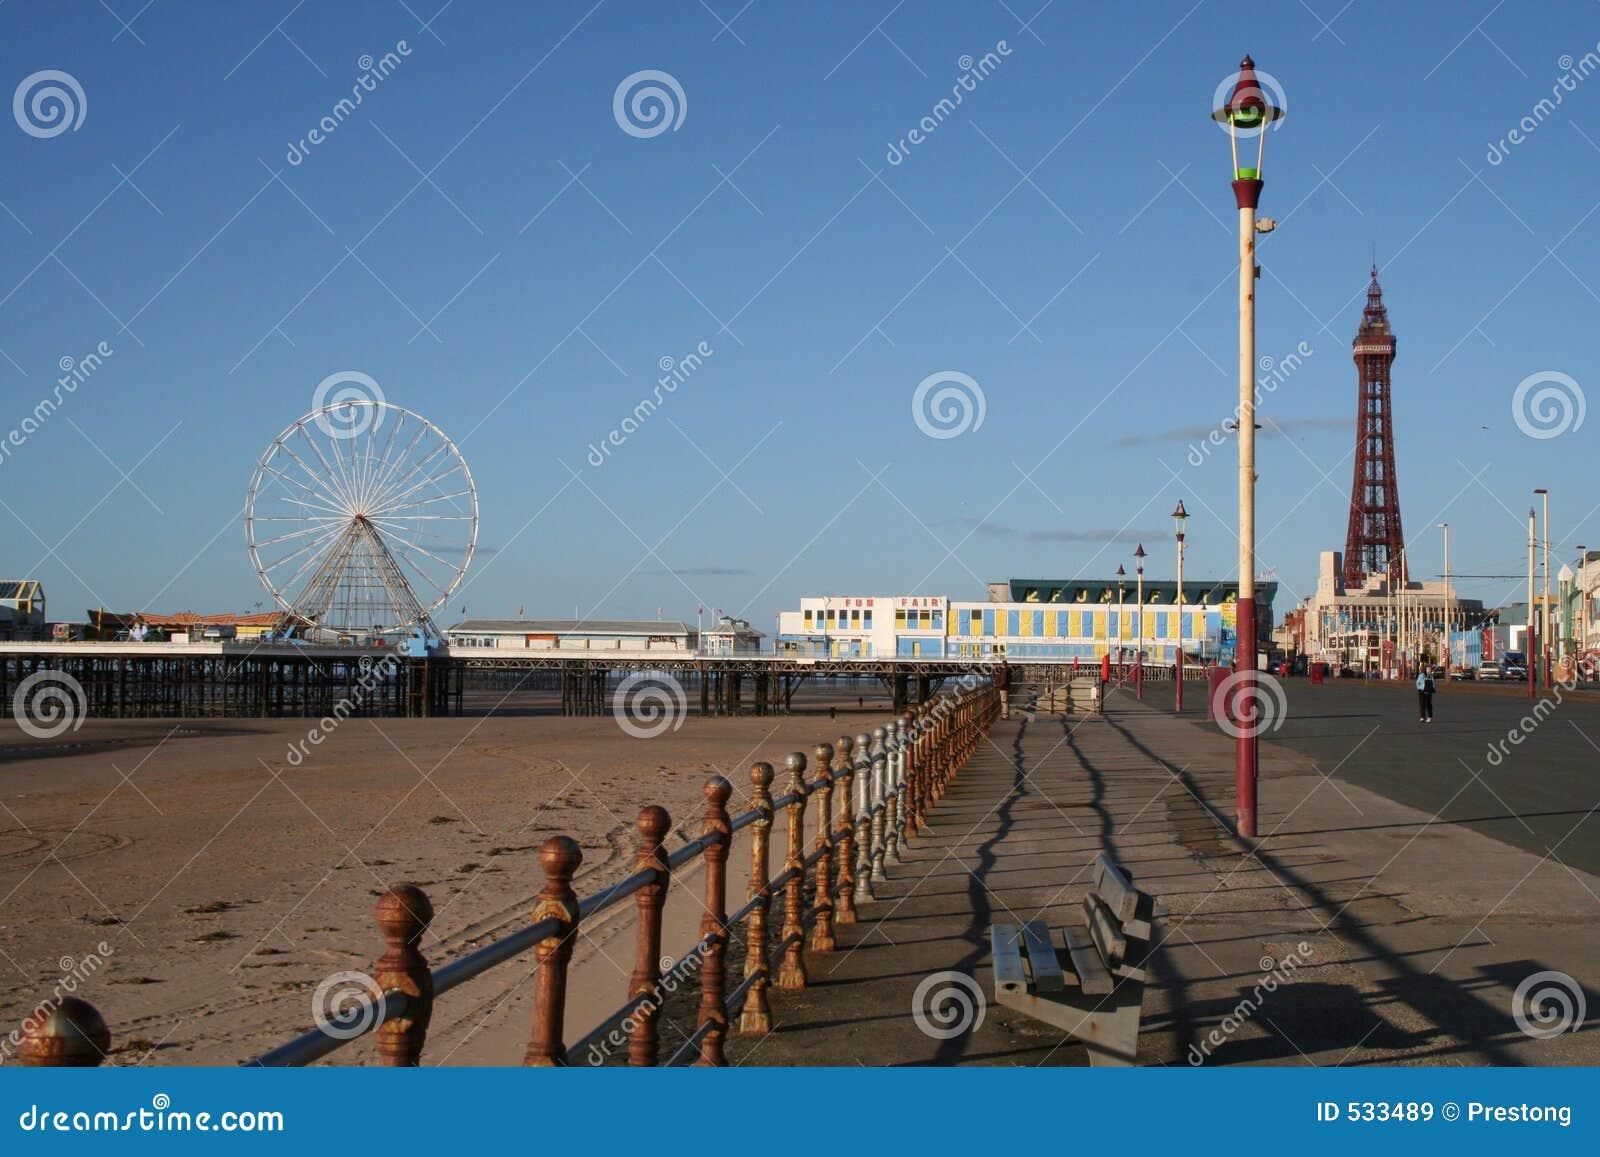 Download 布莱克浦中央ferris码头散步塔轮子 库存图片. 图片 包括有 轮子, 海边, 旅游业, 沙子, 招待, 沿海 - 533489